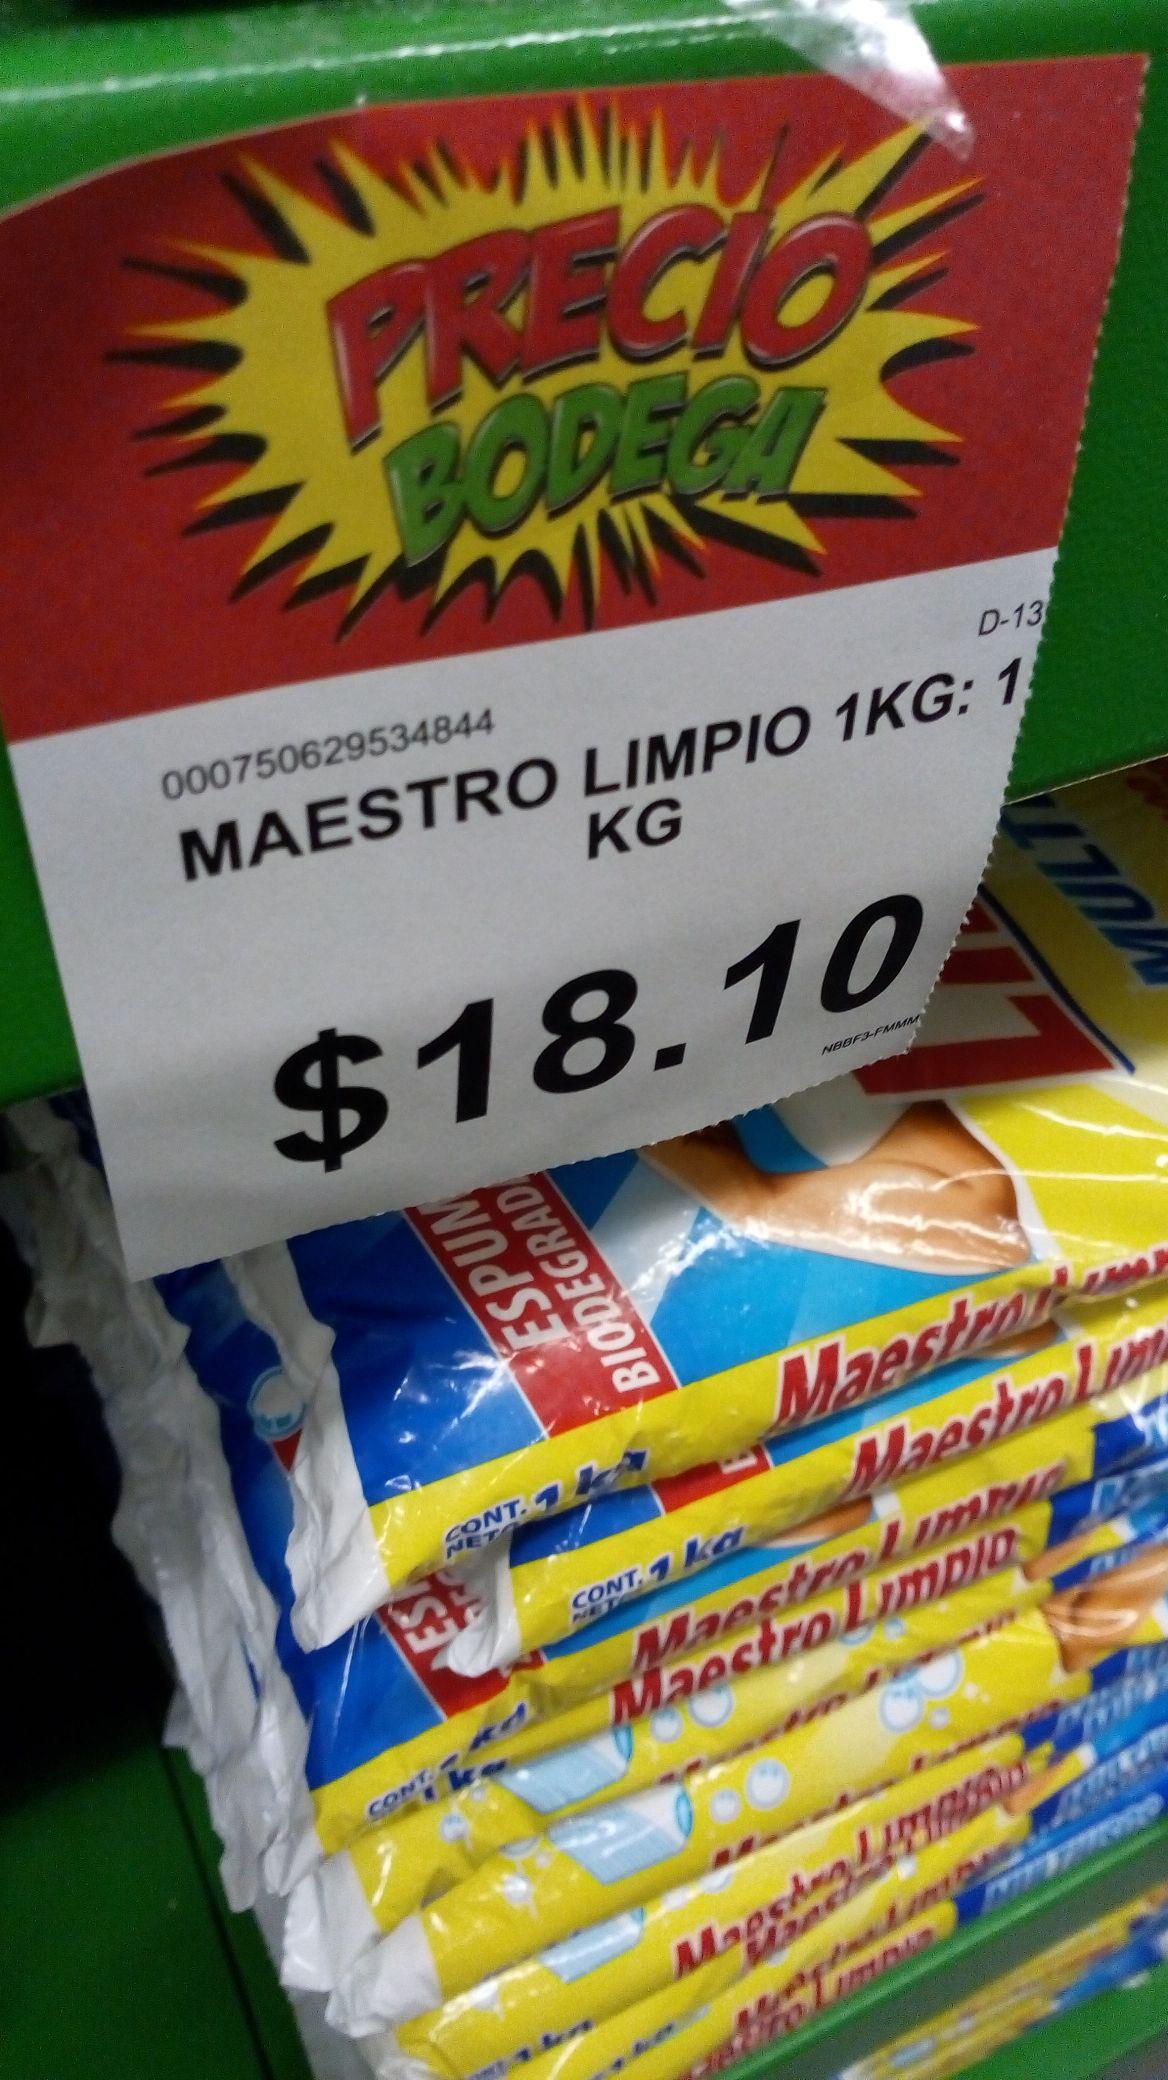 Bodega Aurrerá: Maestro Limpio 1kg